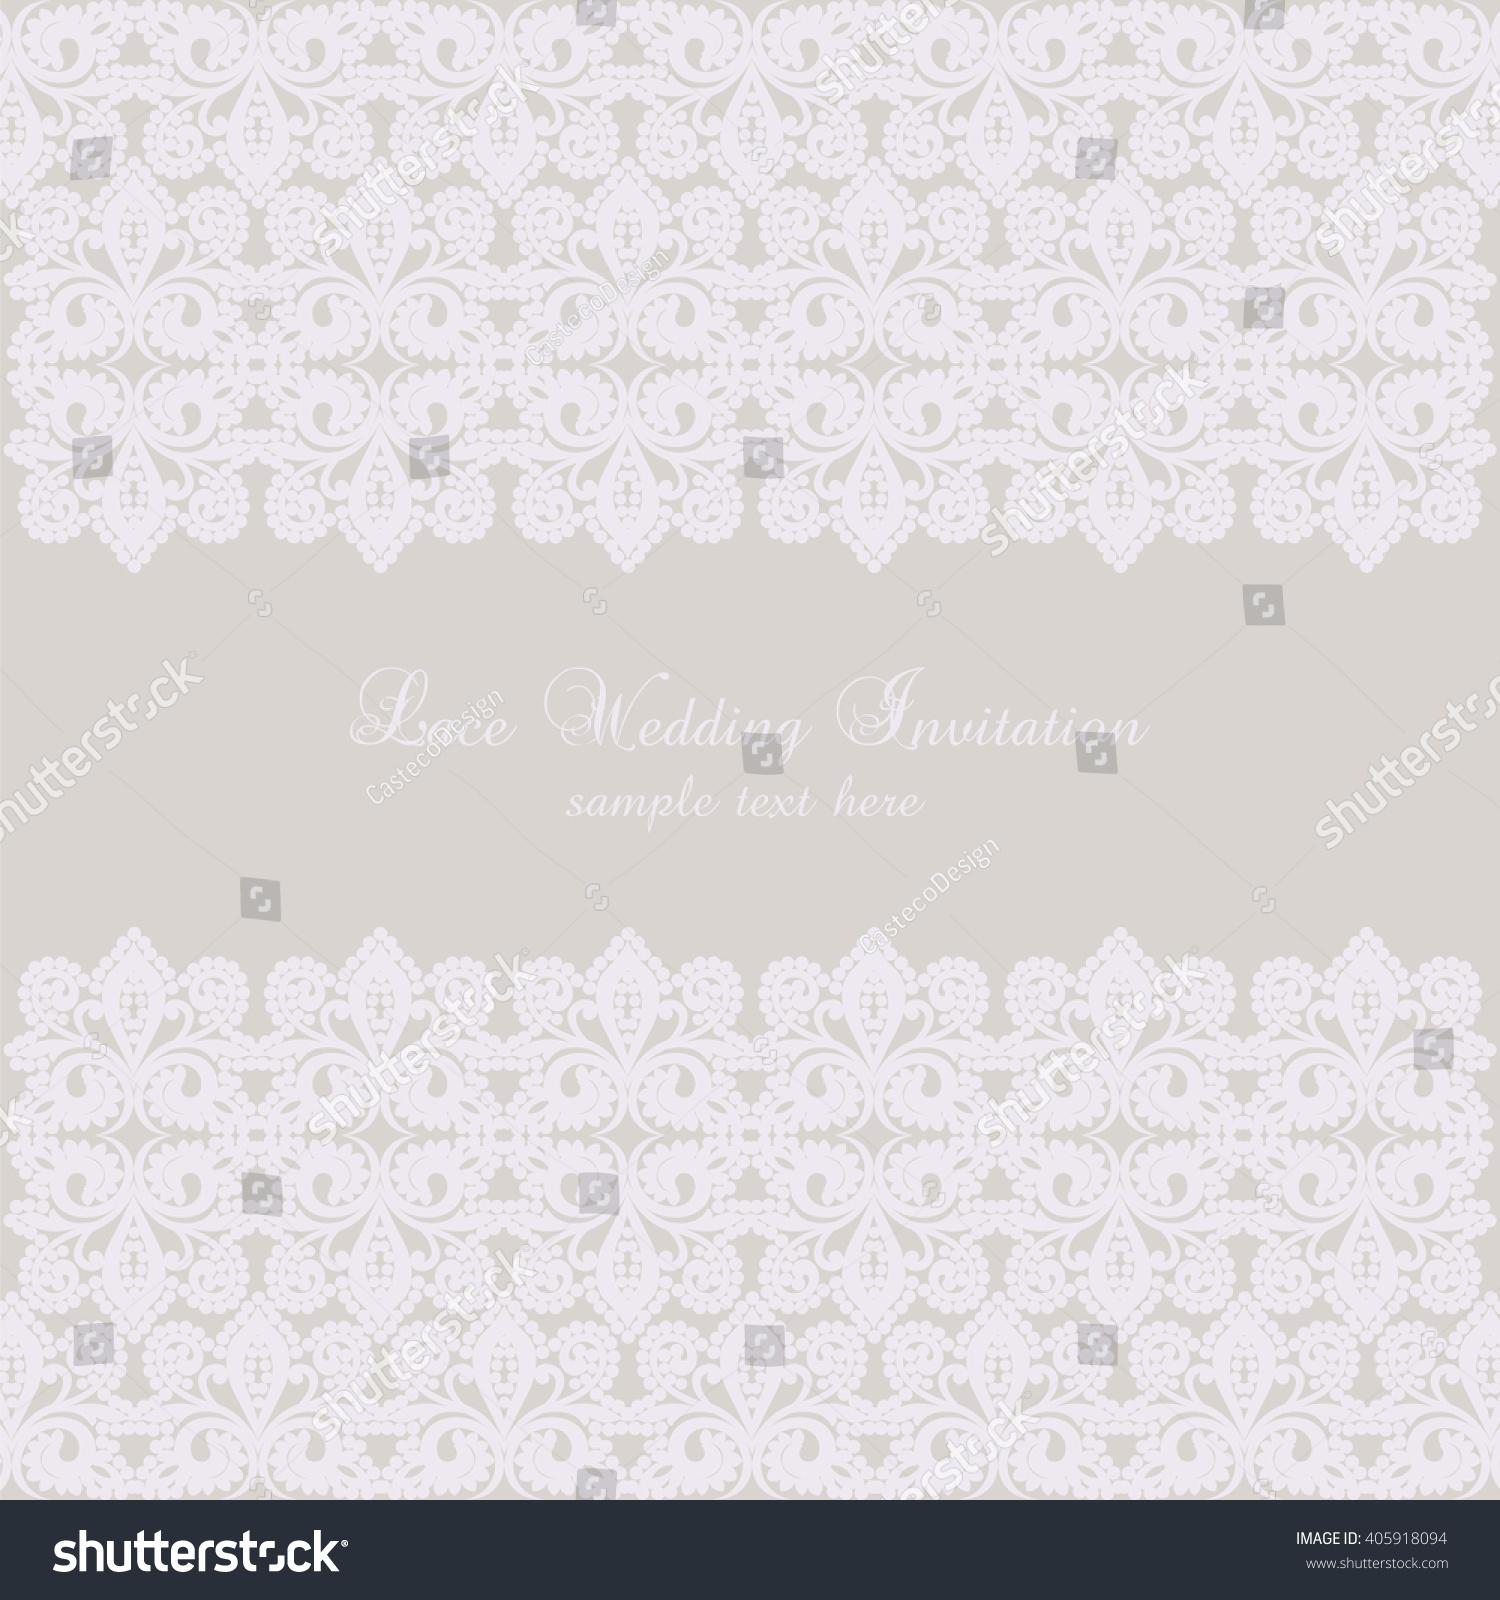 Vector Lace Crochet Card Background Wedding Stock Vector 405918094 ...